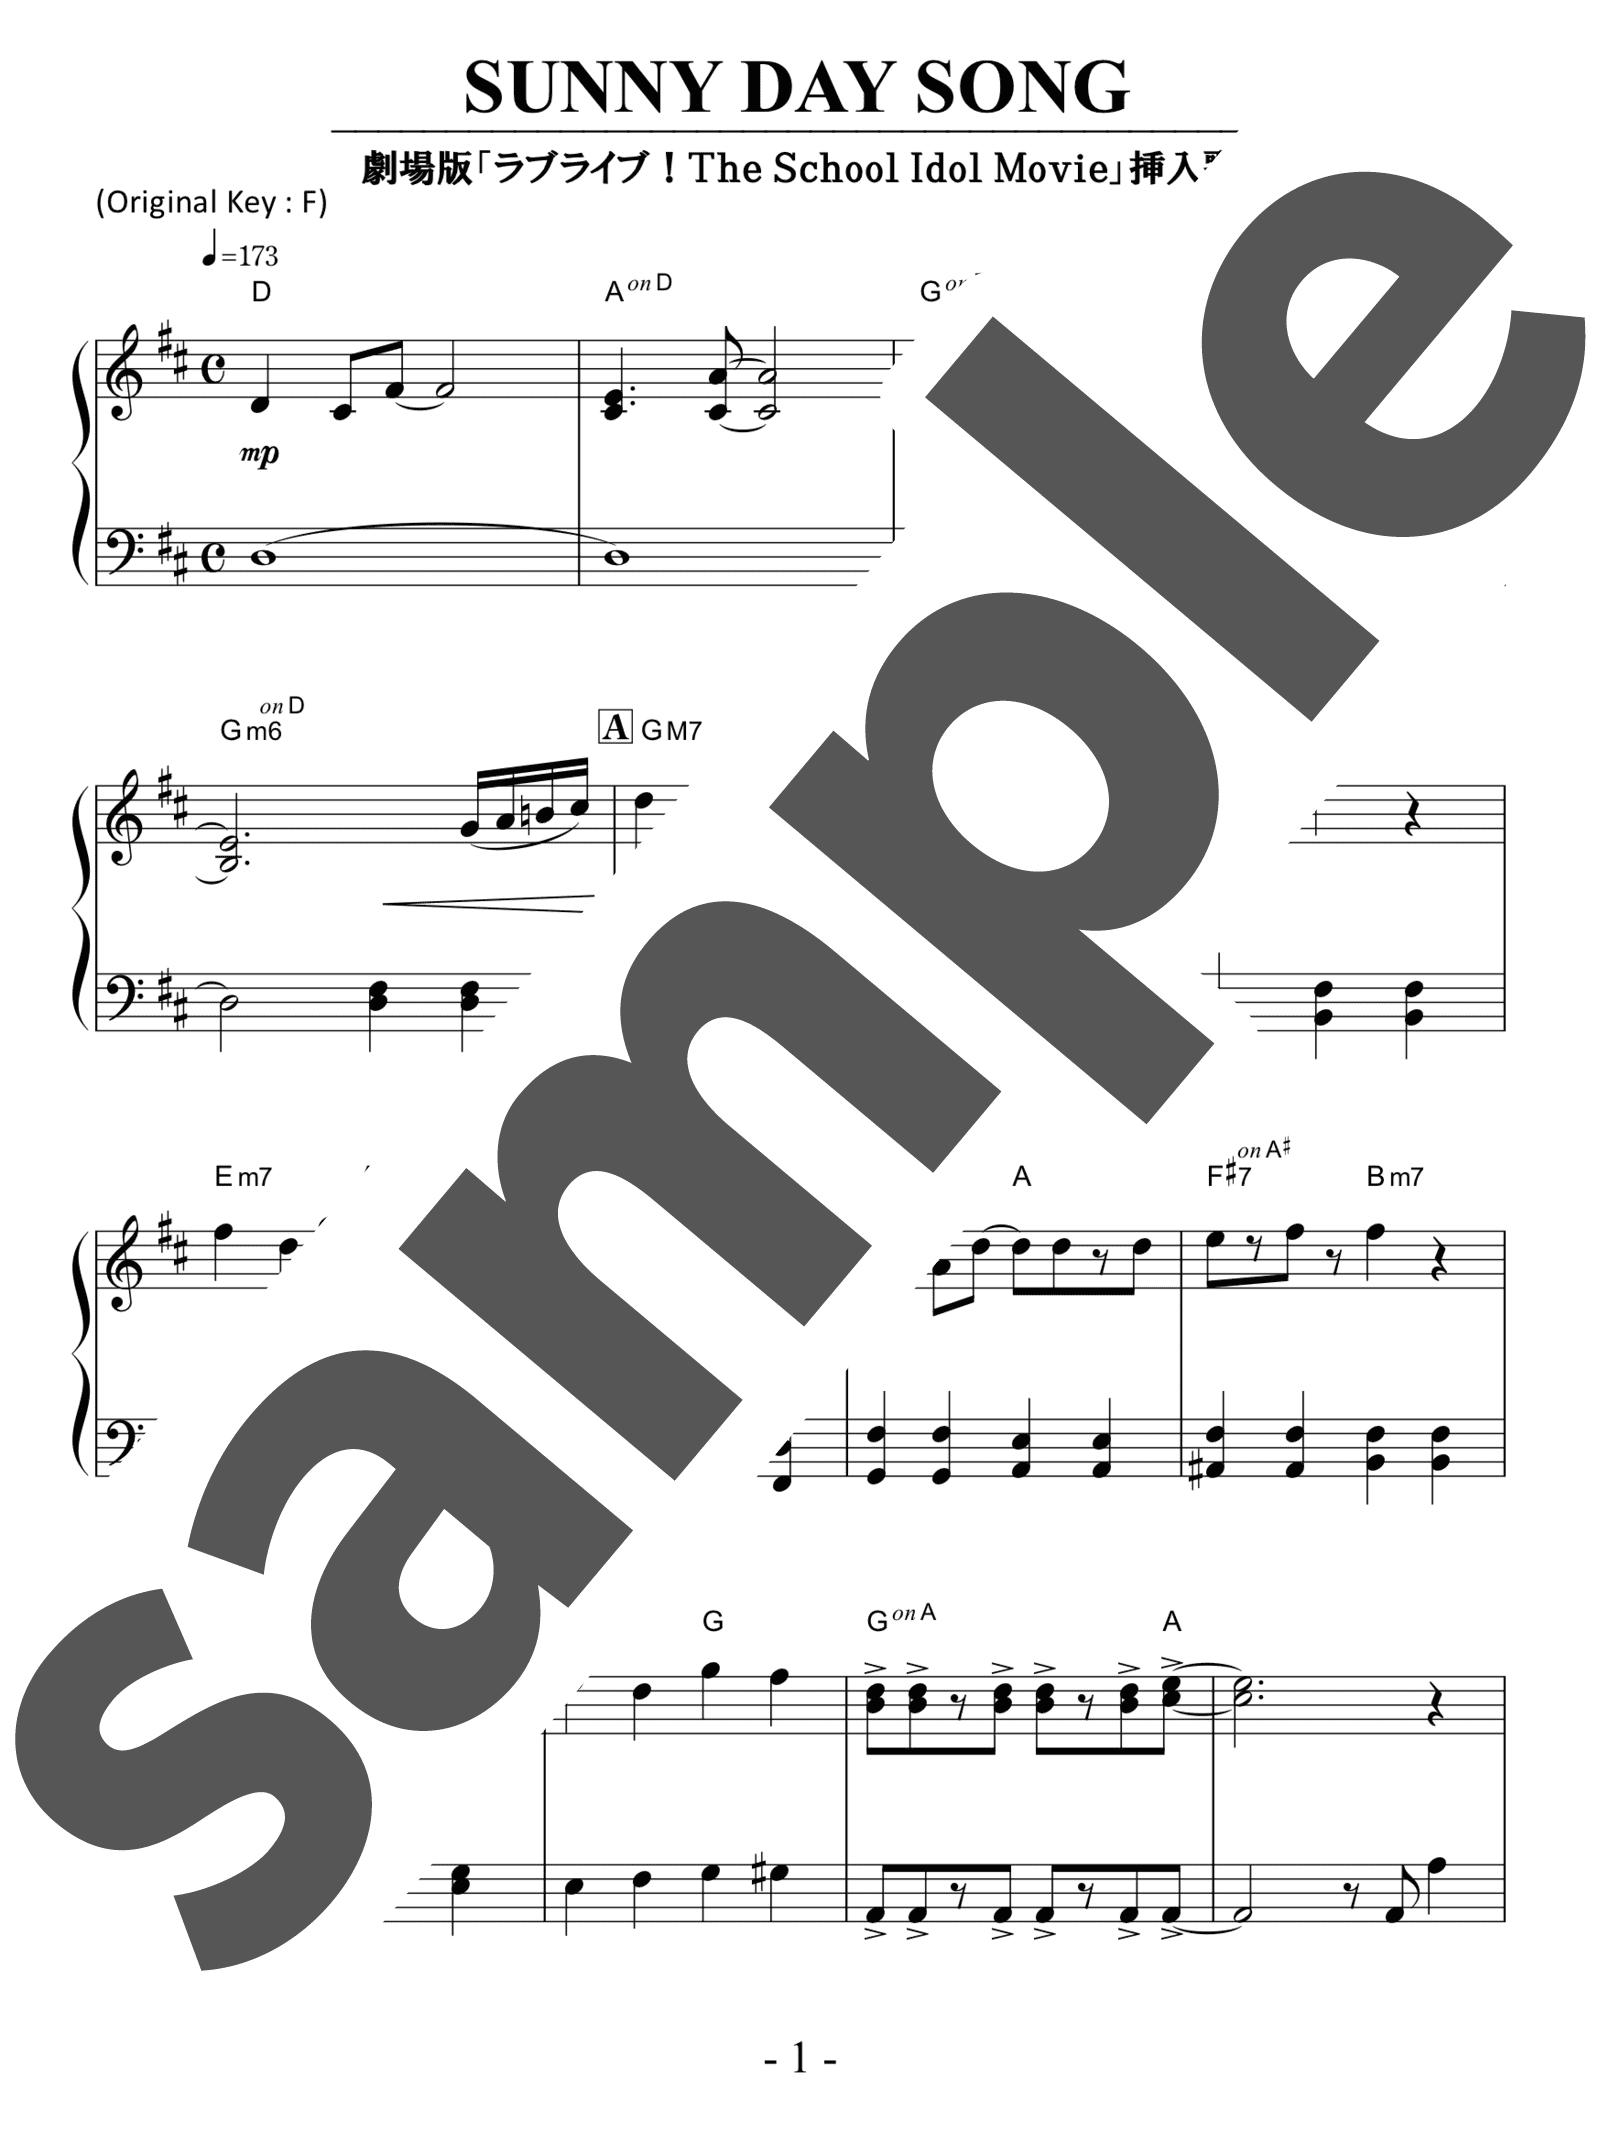 「SUNNY DAY SONG」のサンプル楽譜